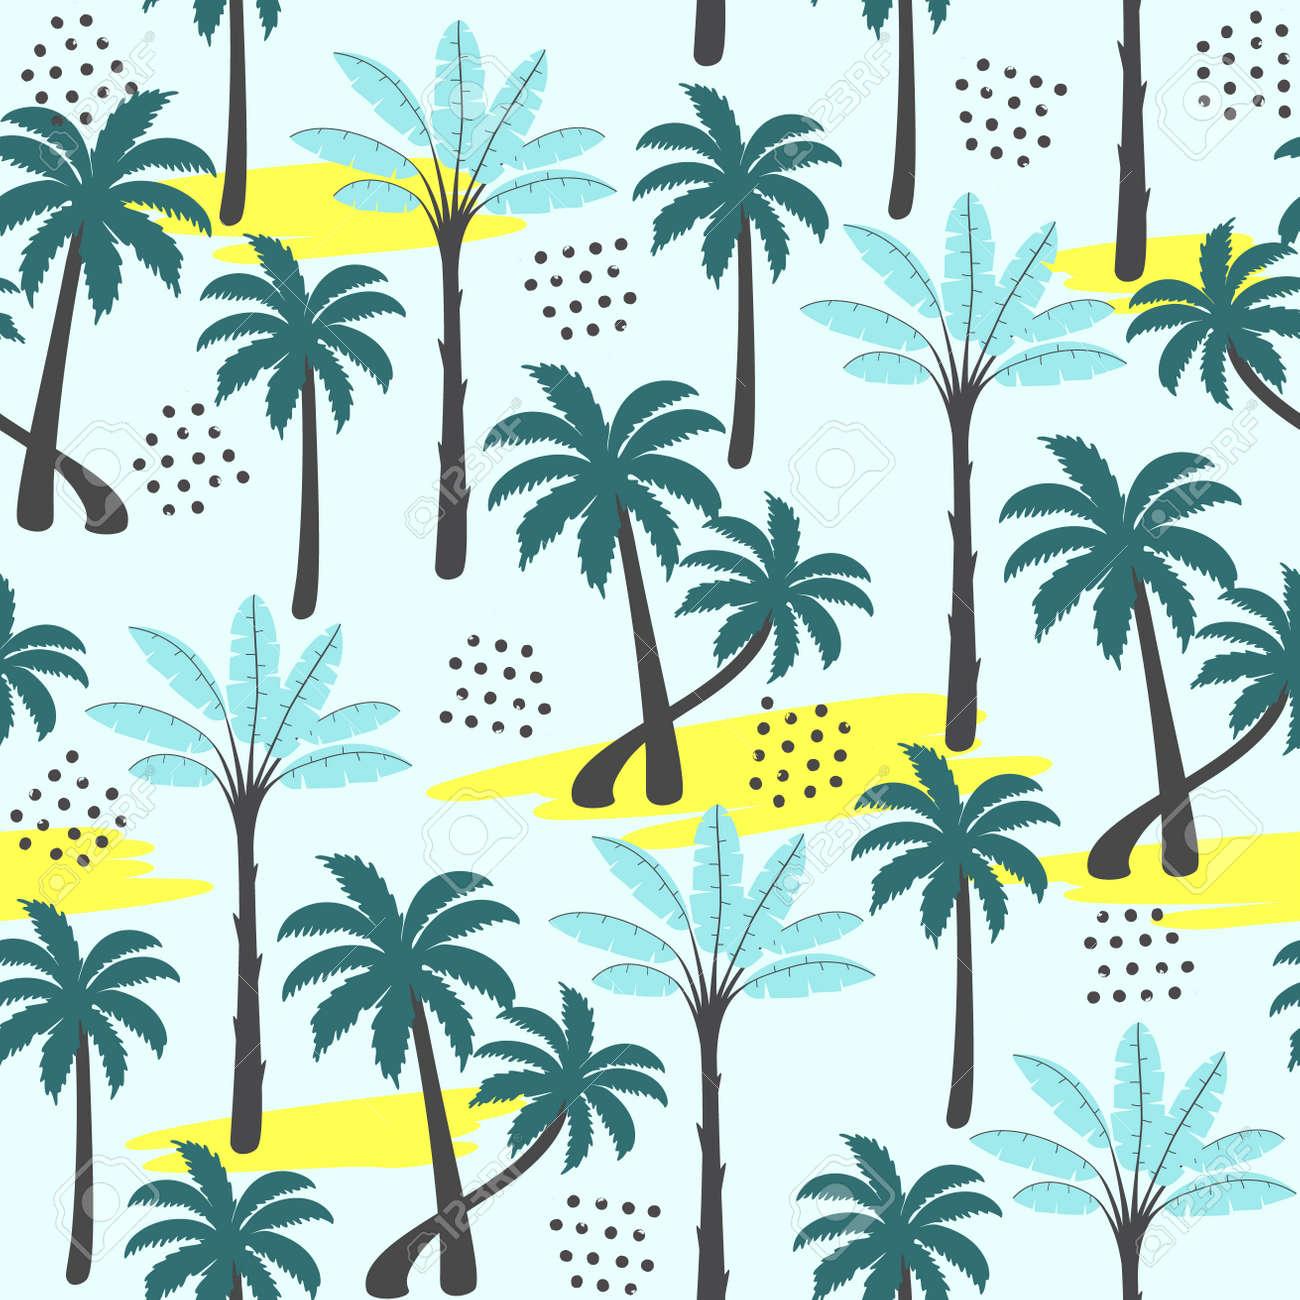 Palm tree seamless pattern on light background. Vector illustration. - 96683400